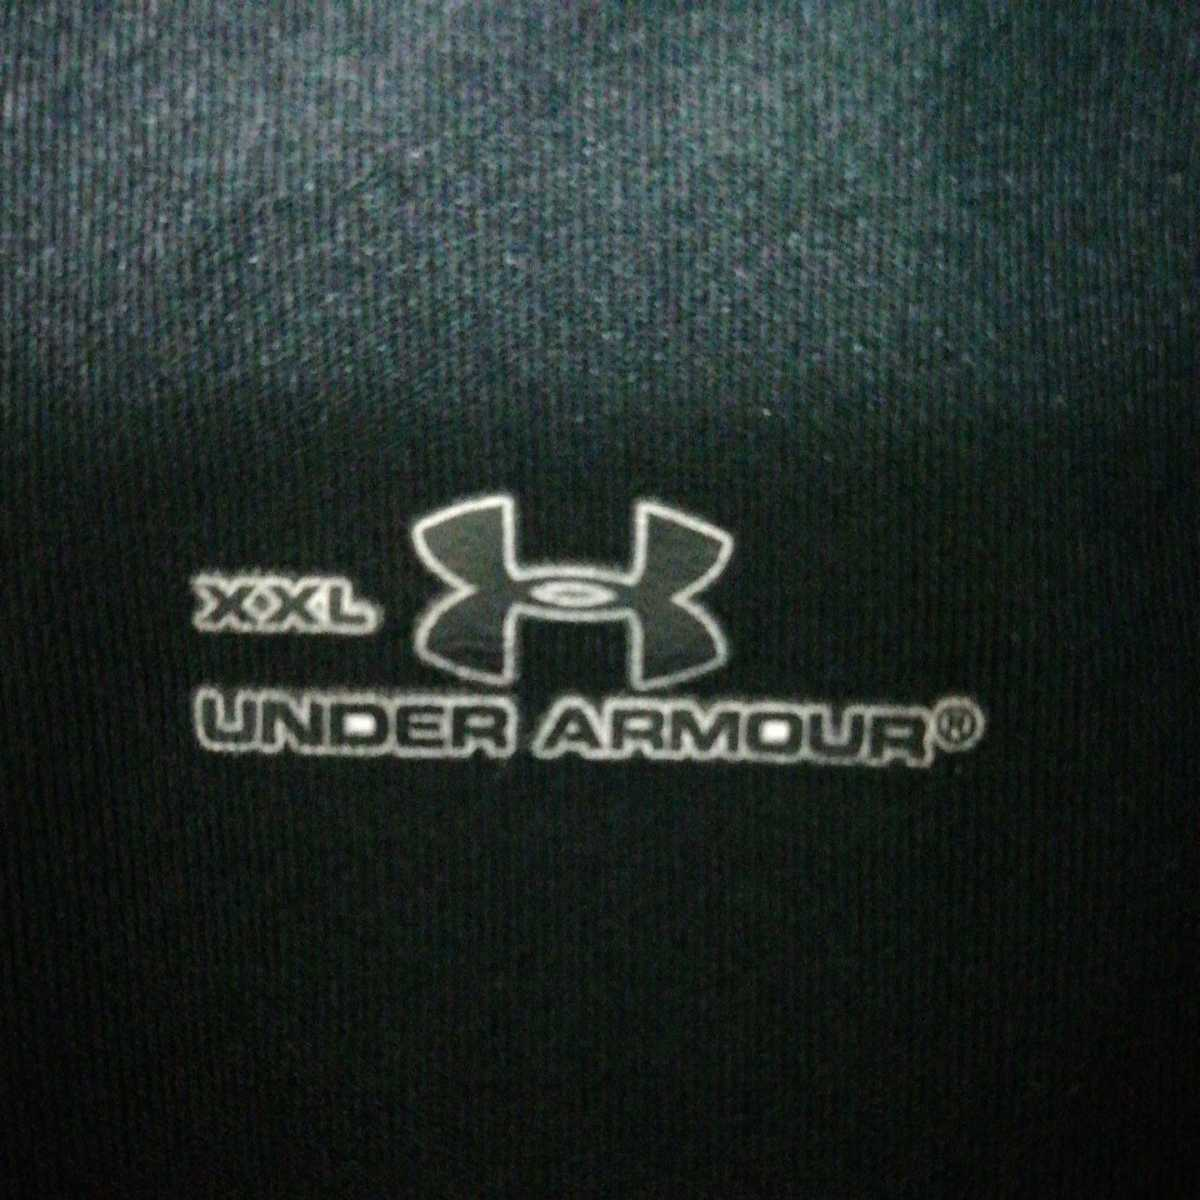 UNDER ARMOUR インナーシャツ XXL